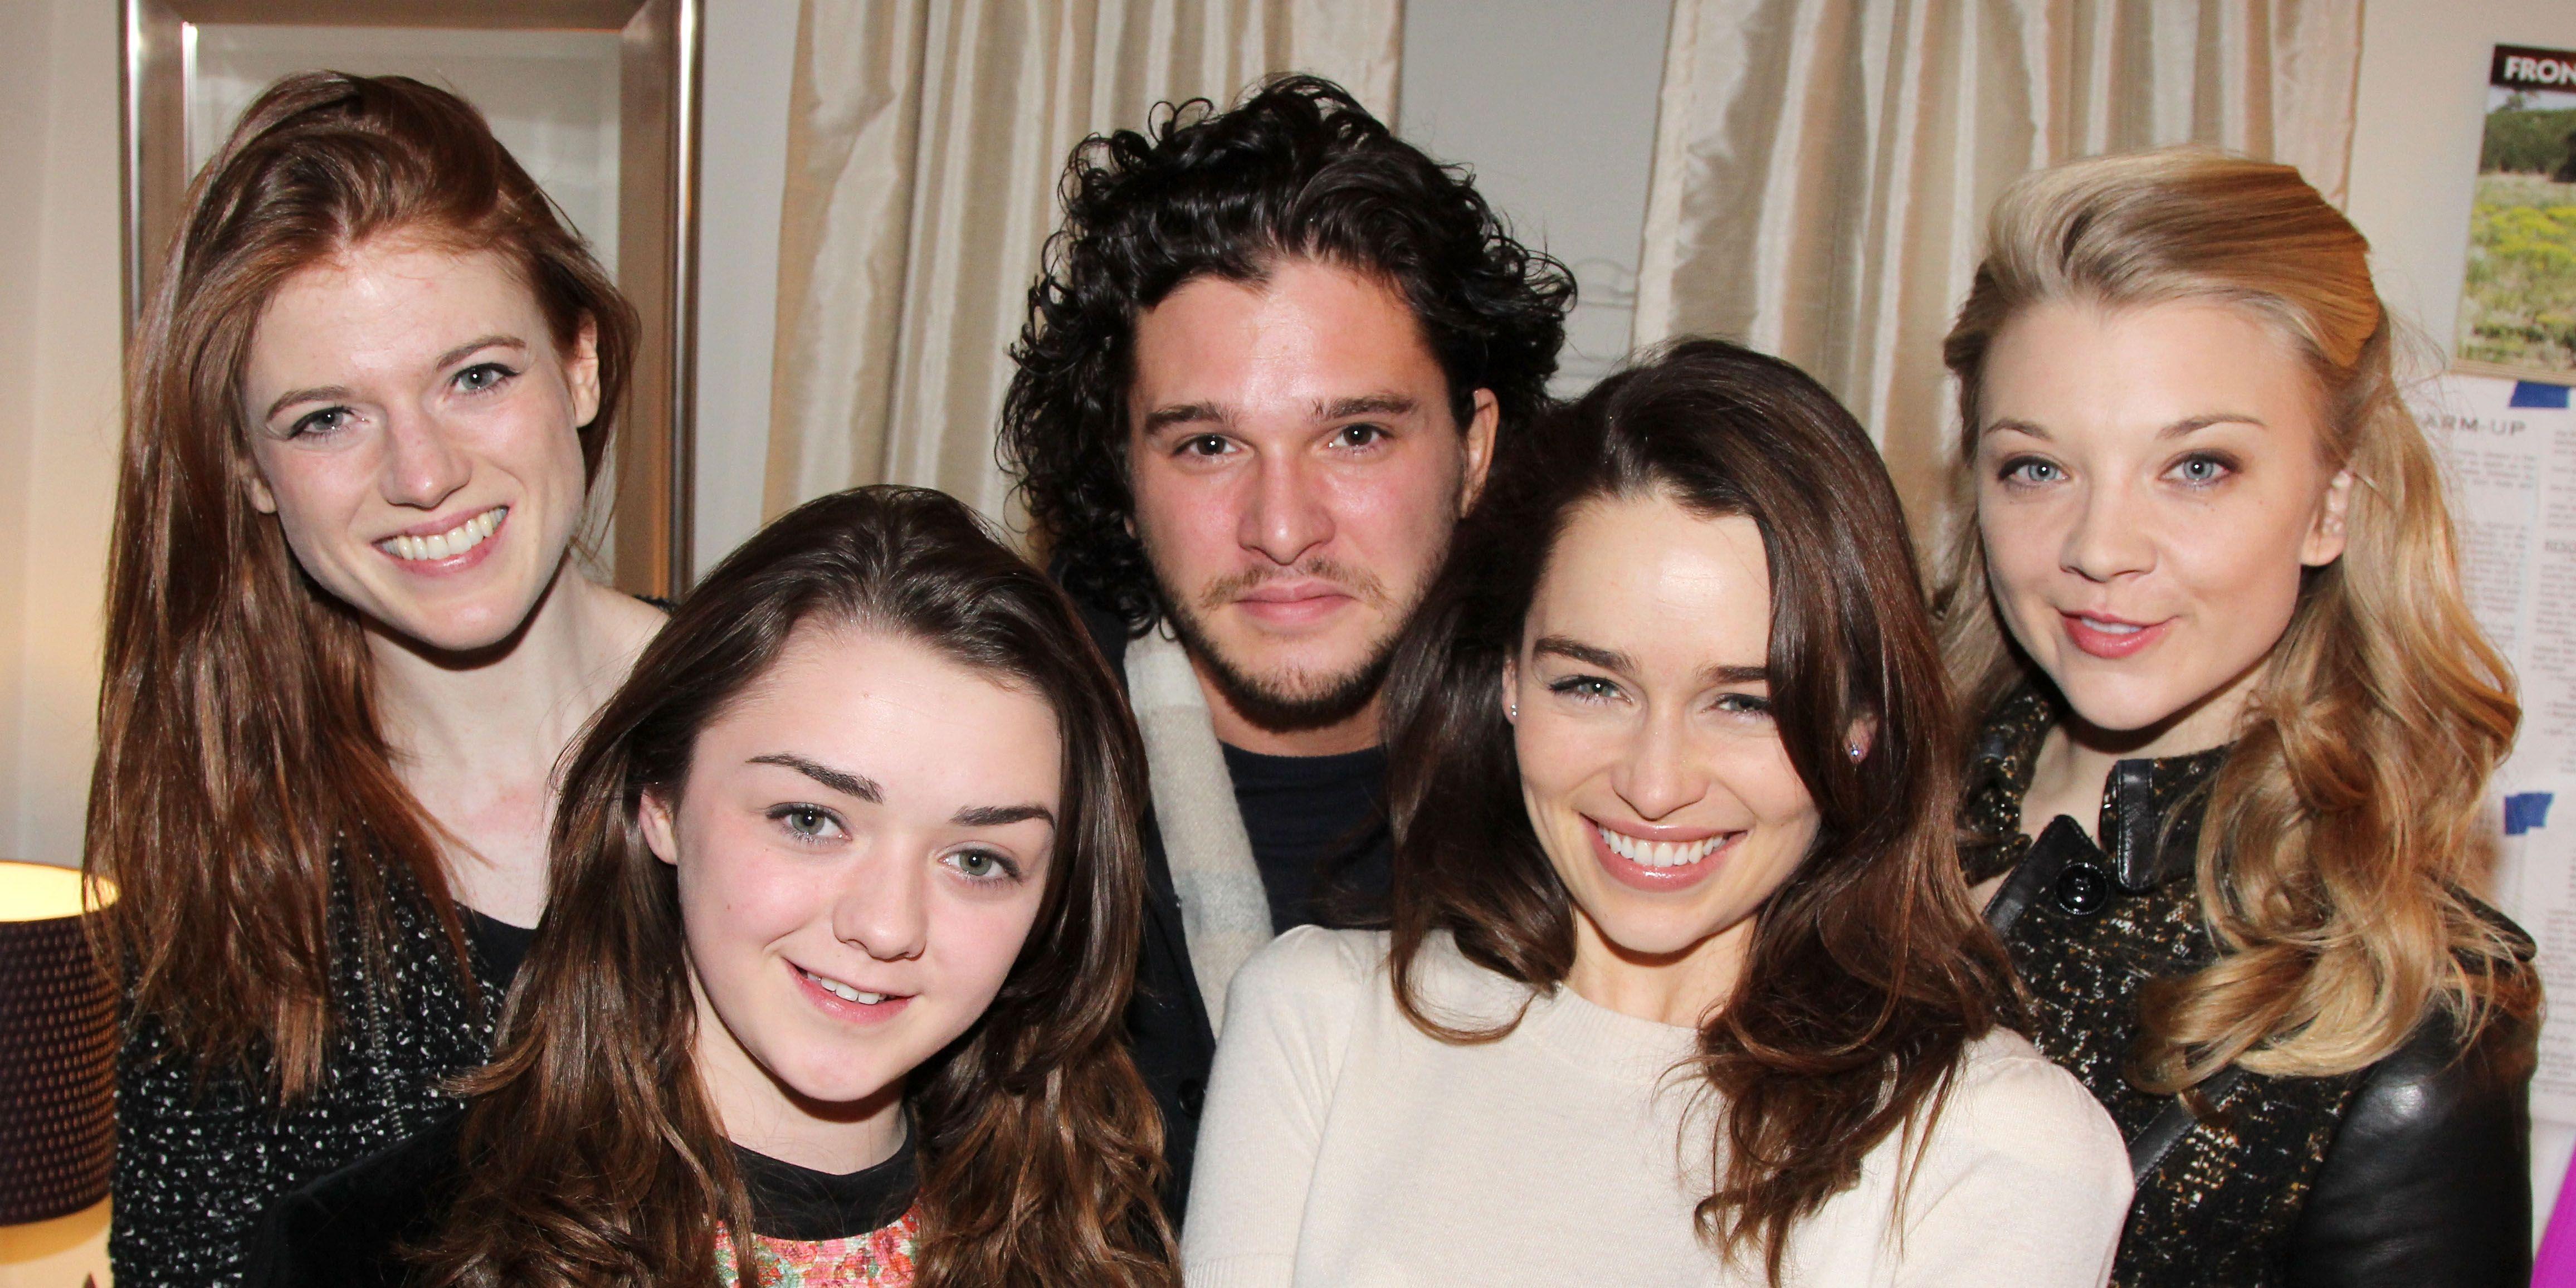 Game of Thrones cast Rose Leslie, Maisie Williams, Kit Harington, Emilia Clarke and Natalie Dormer